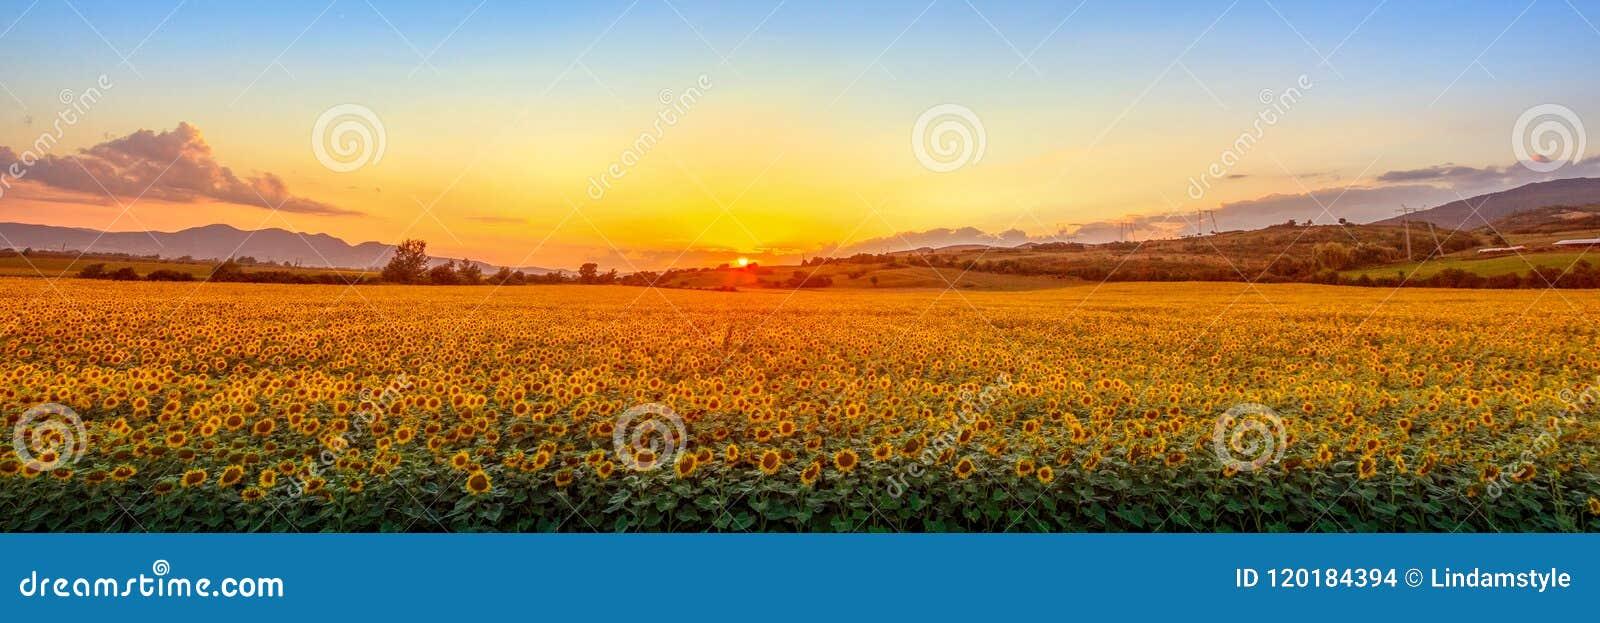 Sunset with sunflower field